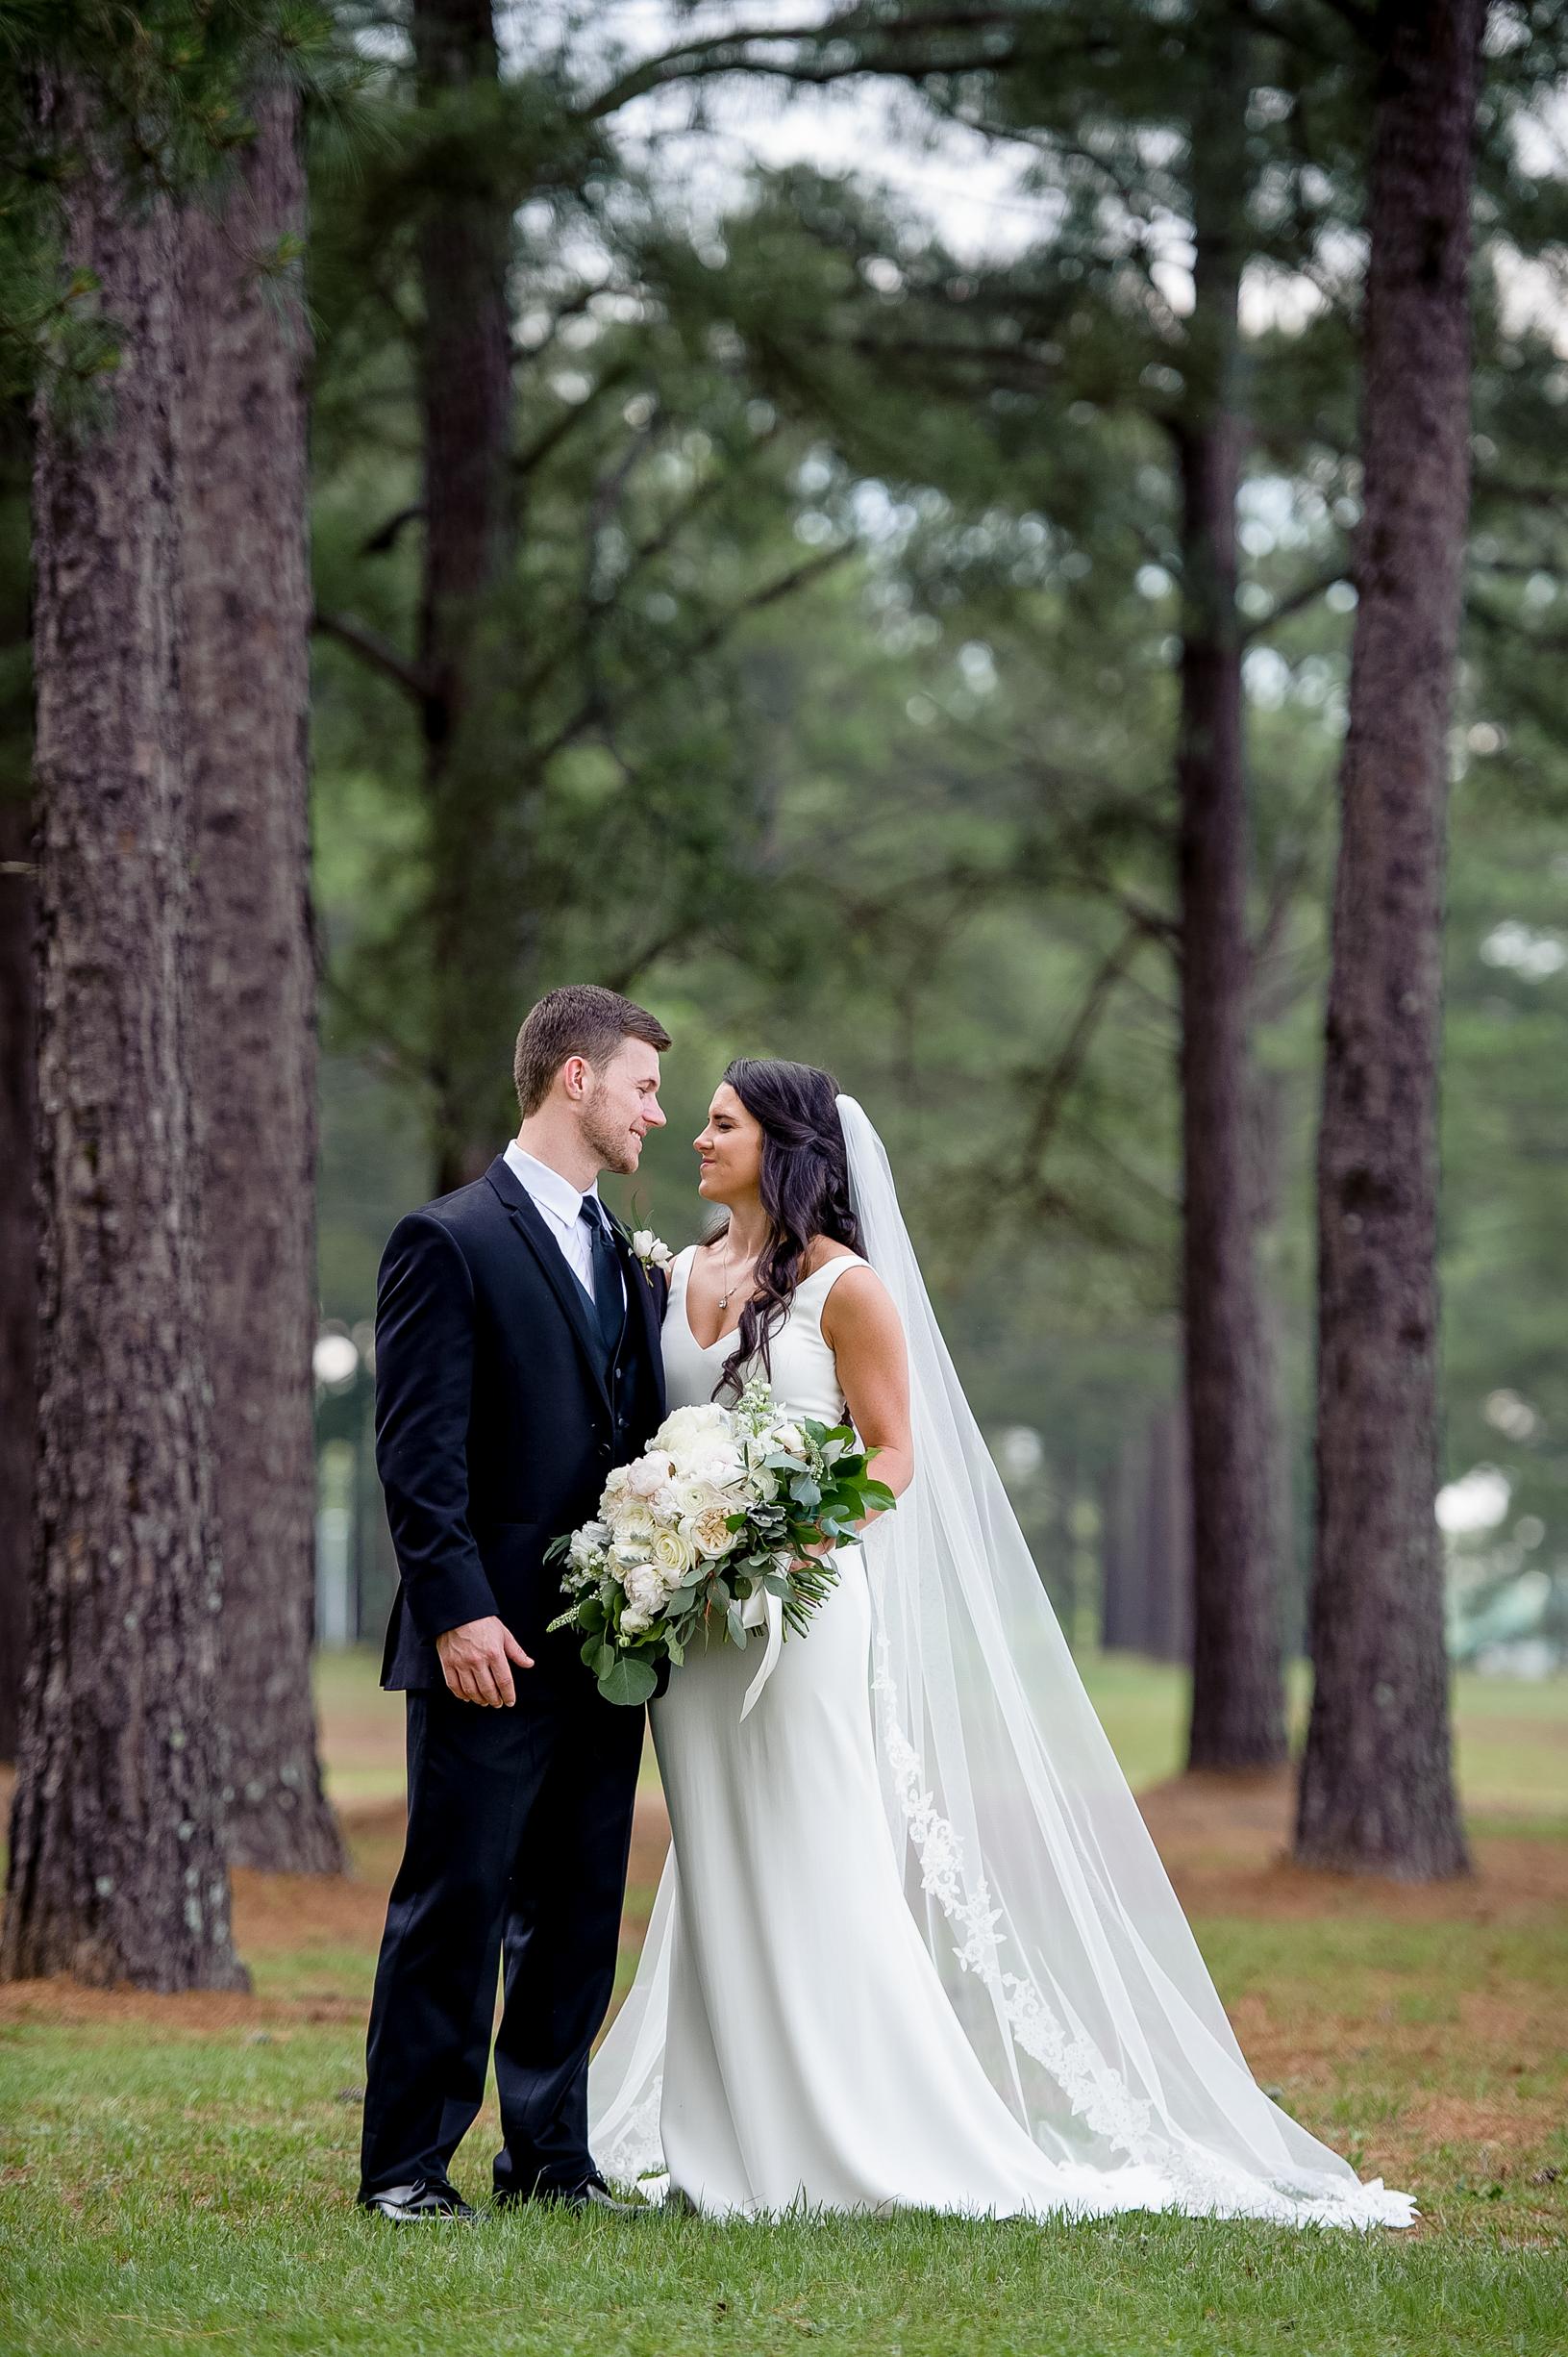 Royal Wedding with Outdoor Reception-26.JPG